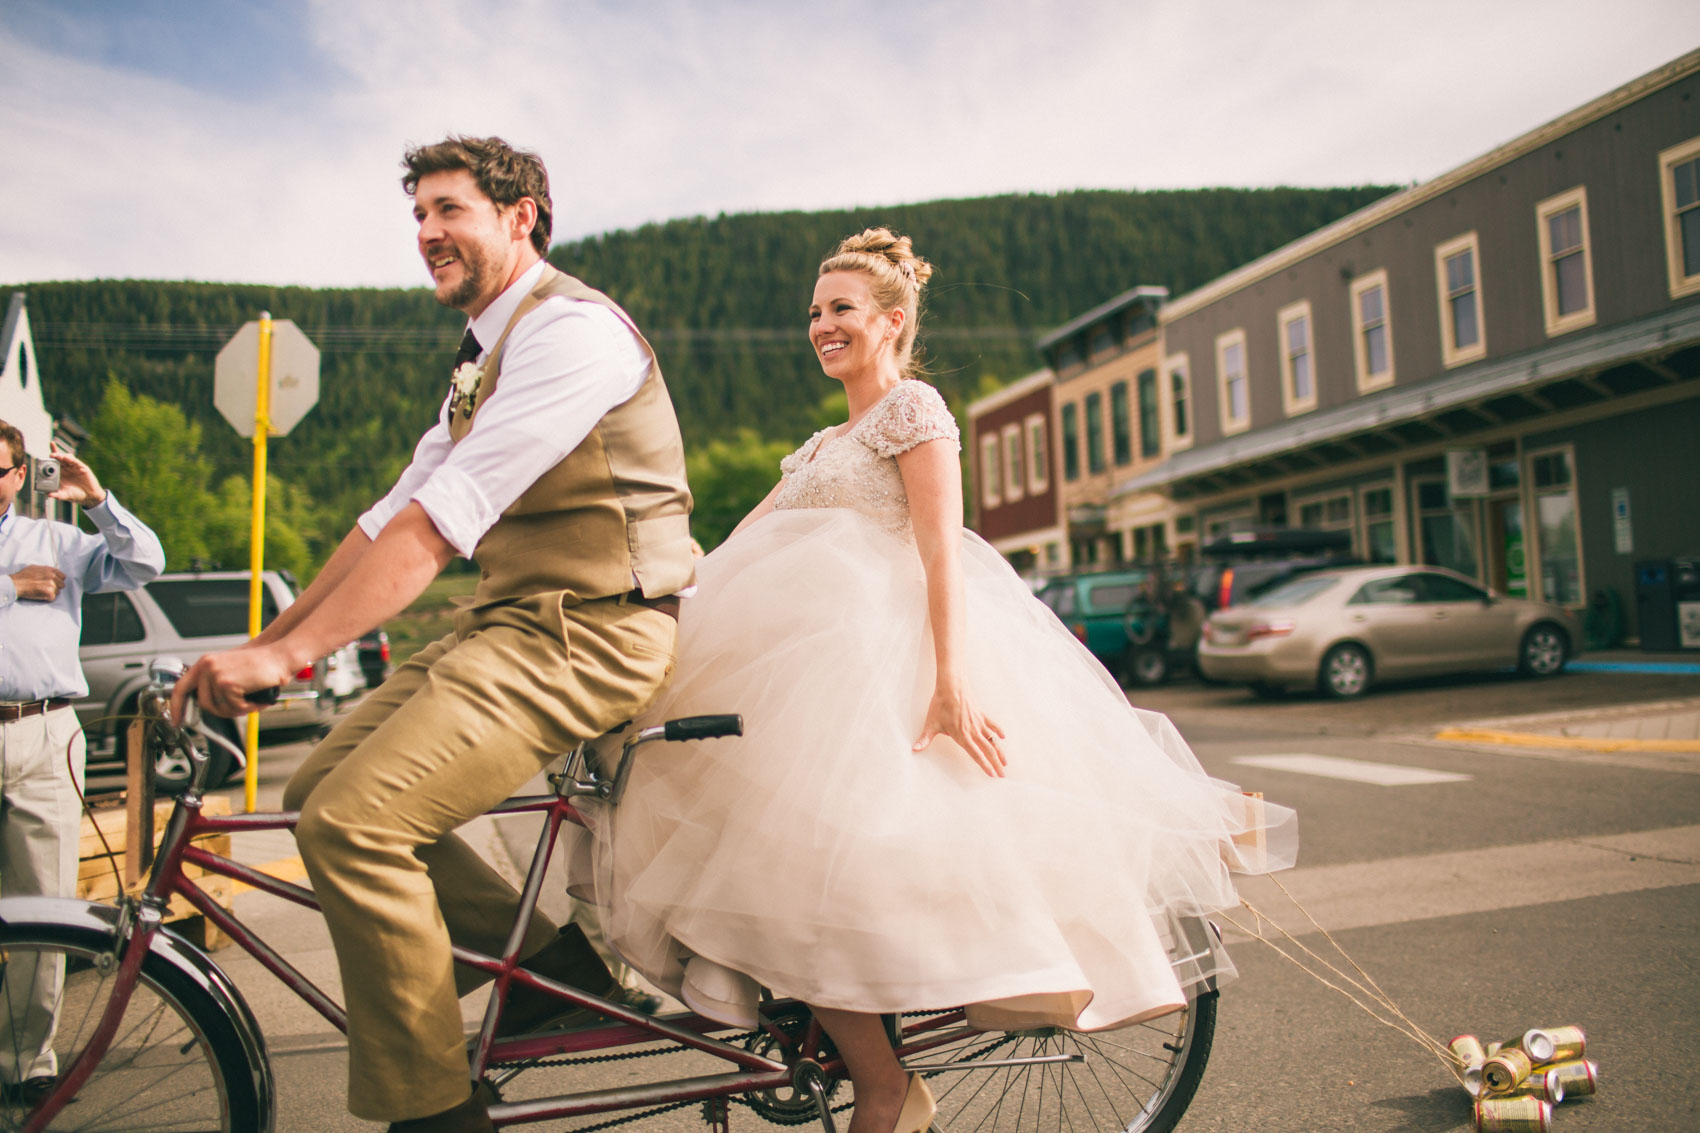 043_Crested Butte Wedding Photographer Secret Stash Woods Walk Ceremony Jamie Blue Bird Events Boho Epic Stars